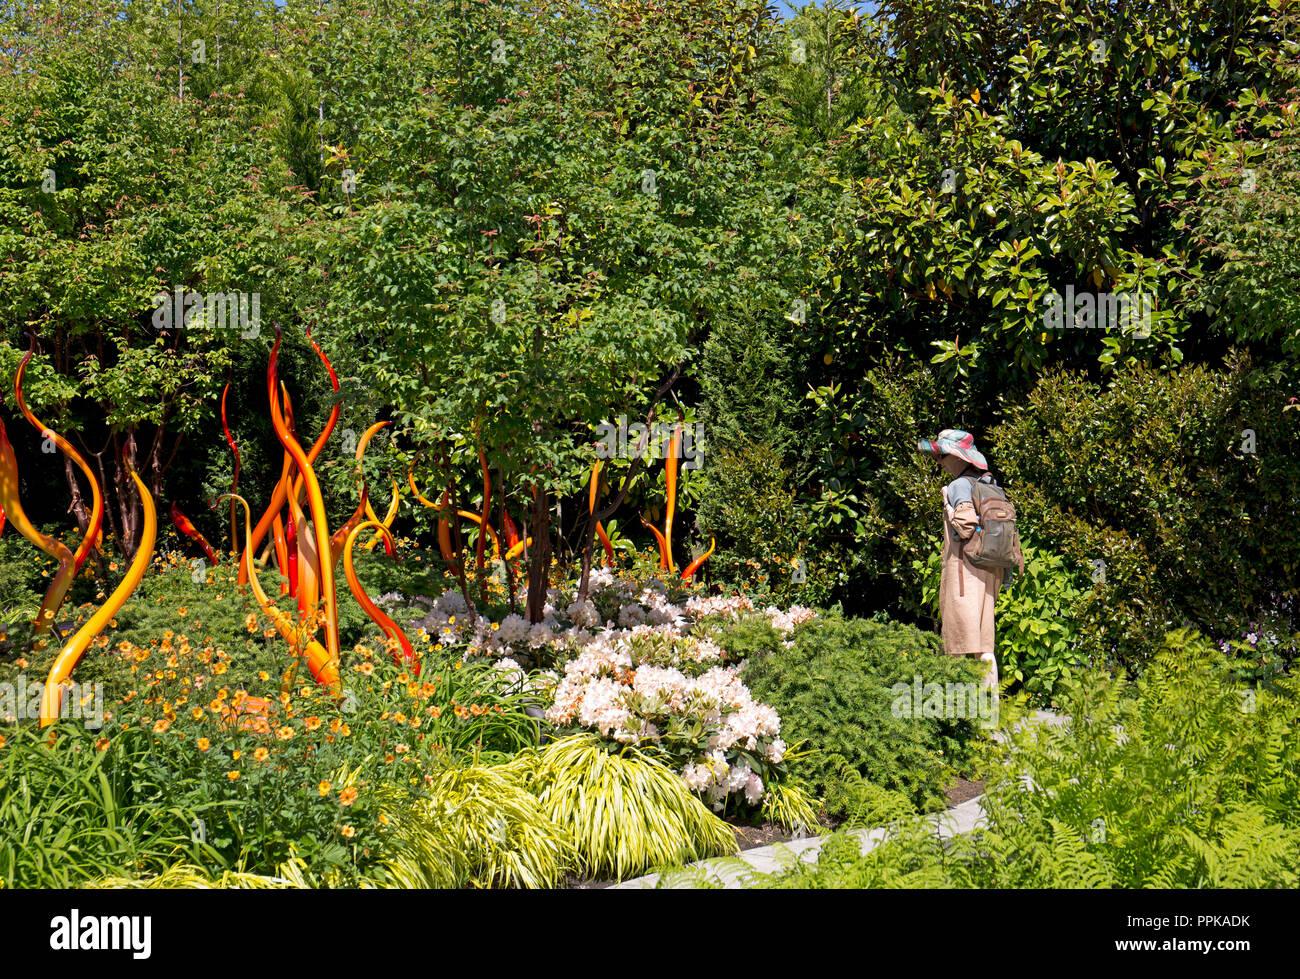 Dale Chihuly, hand blown glass, Seattle, Washington State, USA - Stock Image